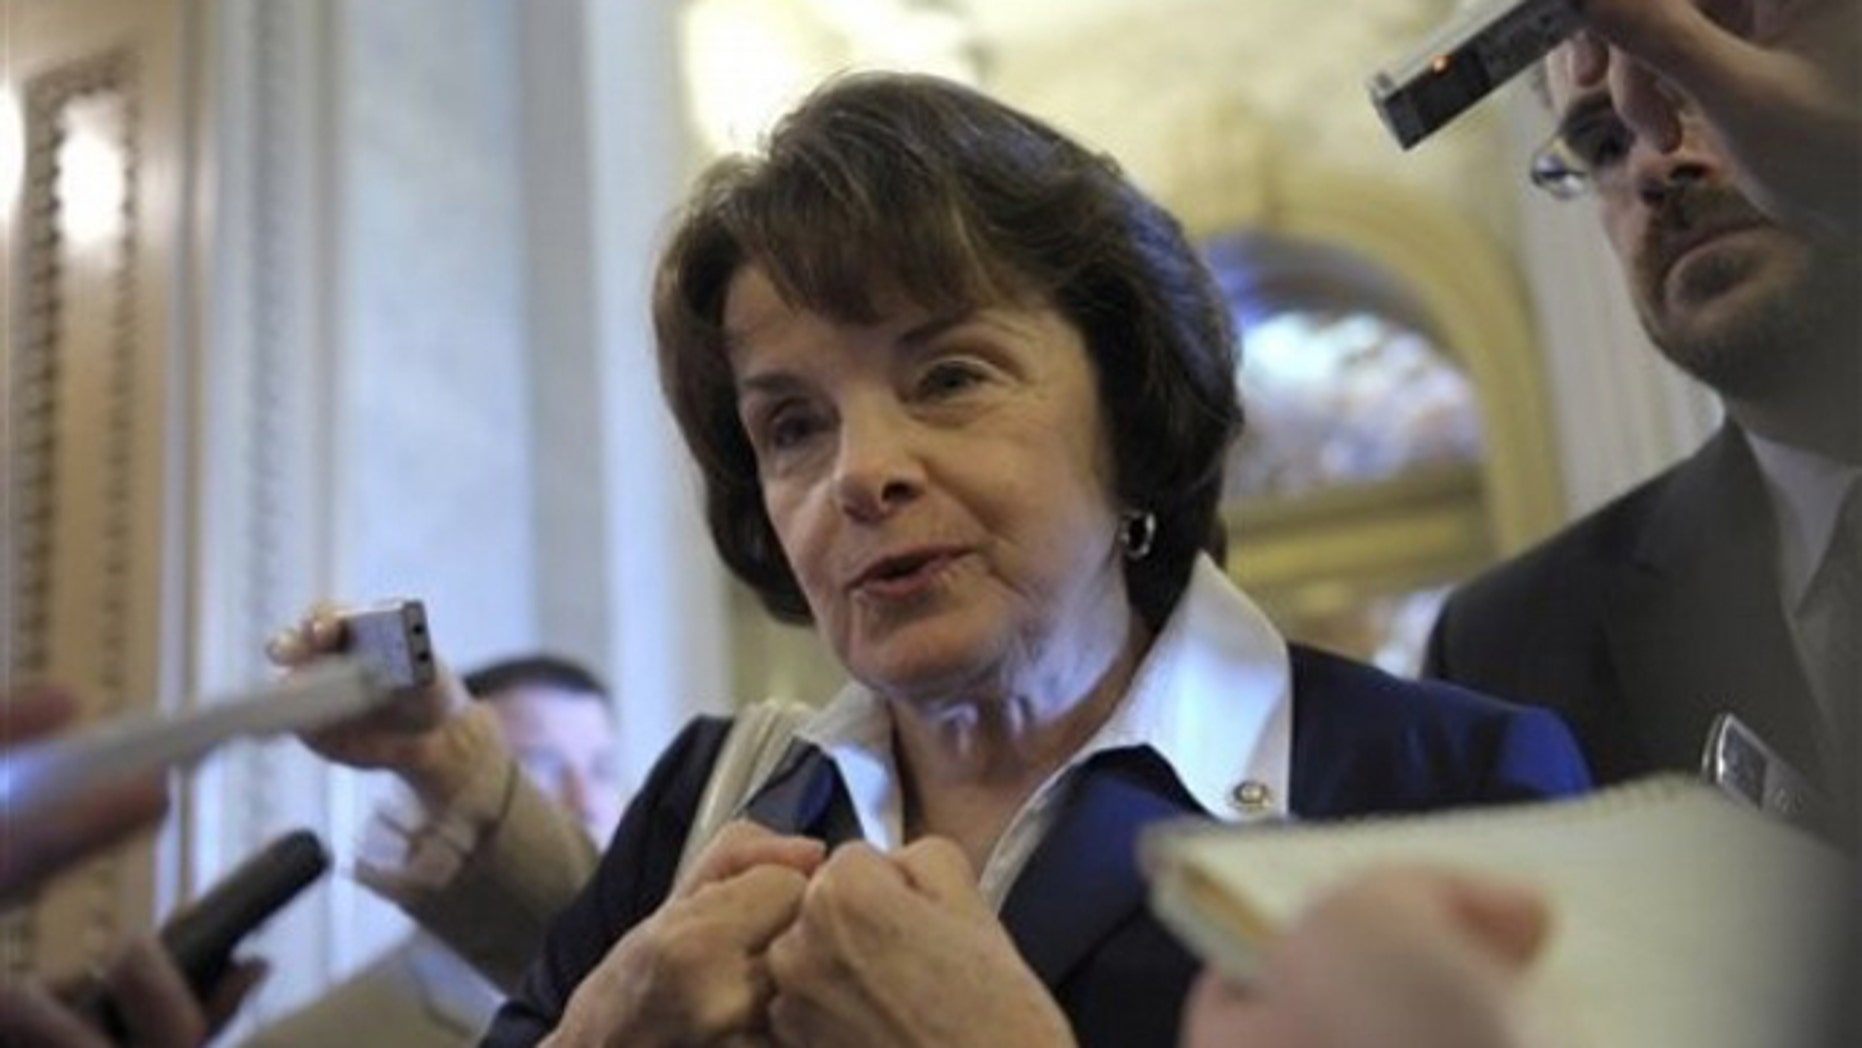 Sen. Dianne Feinstein speaks to reporters on Capitol Hill in Washington July 31.